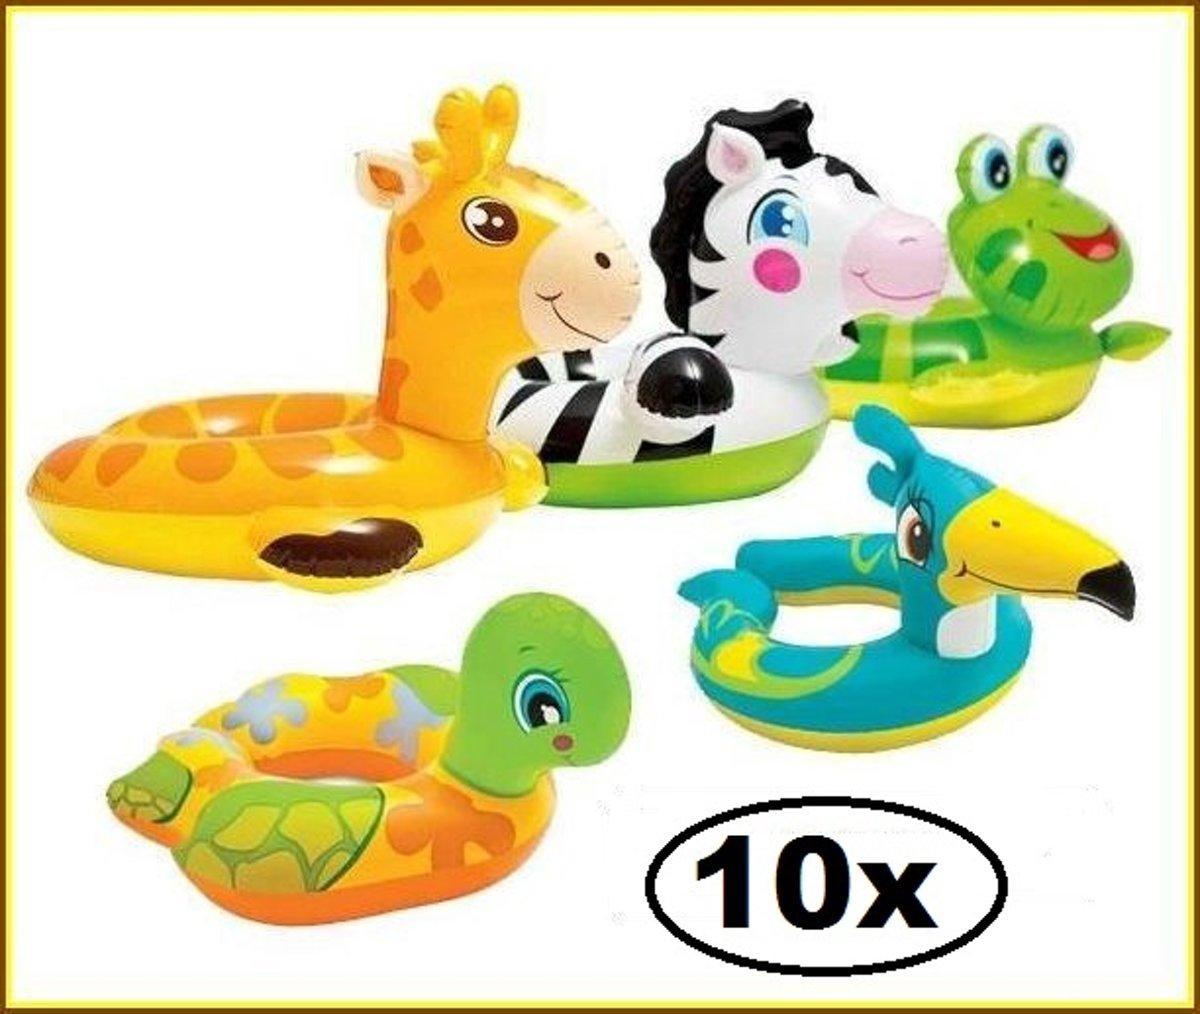 10x Intex Split Zwemband assortie